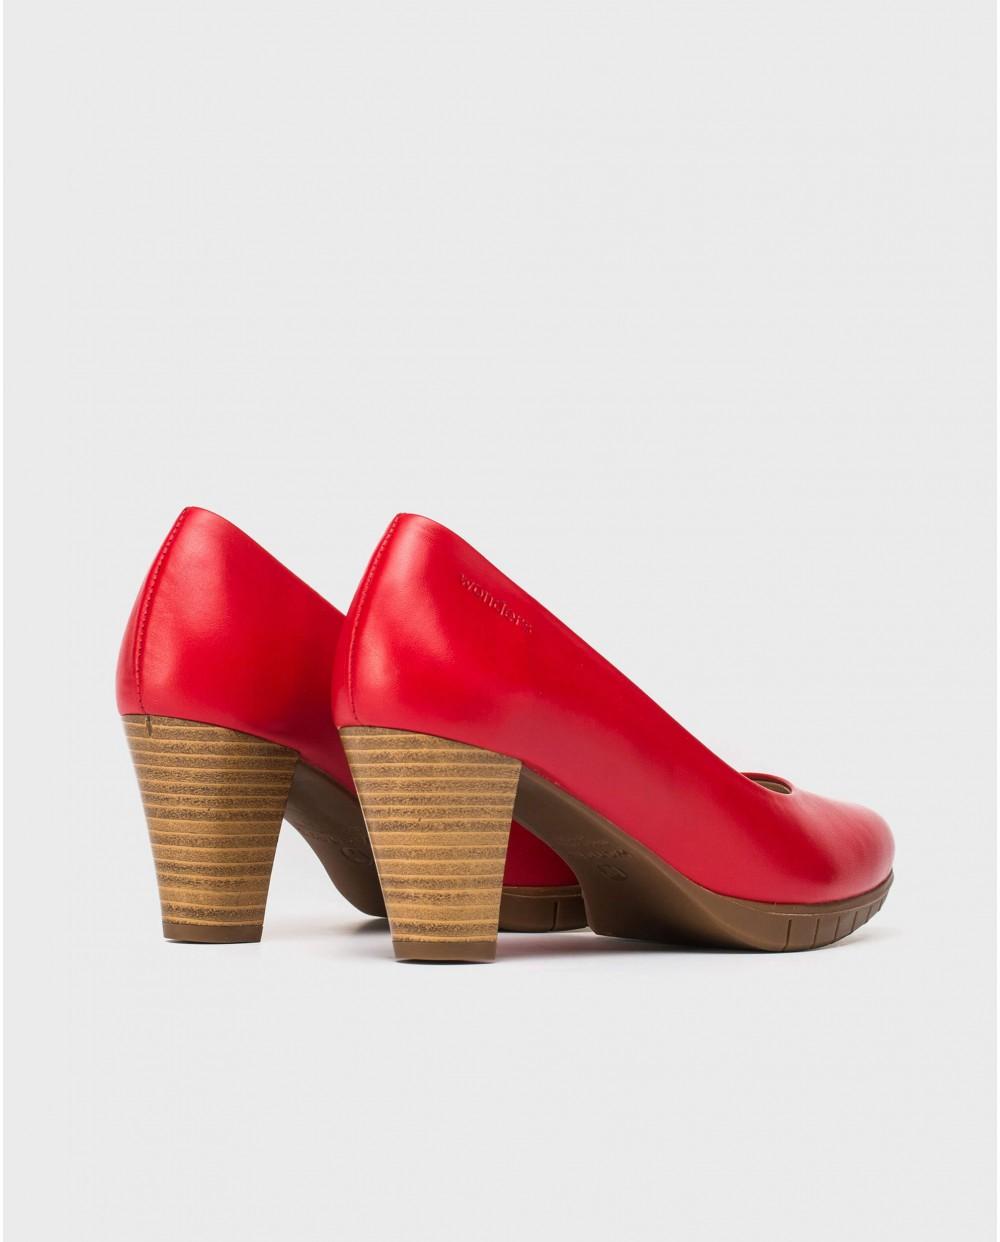 Wonders-Women-High heeled shoe